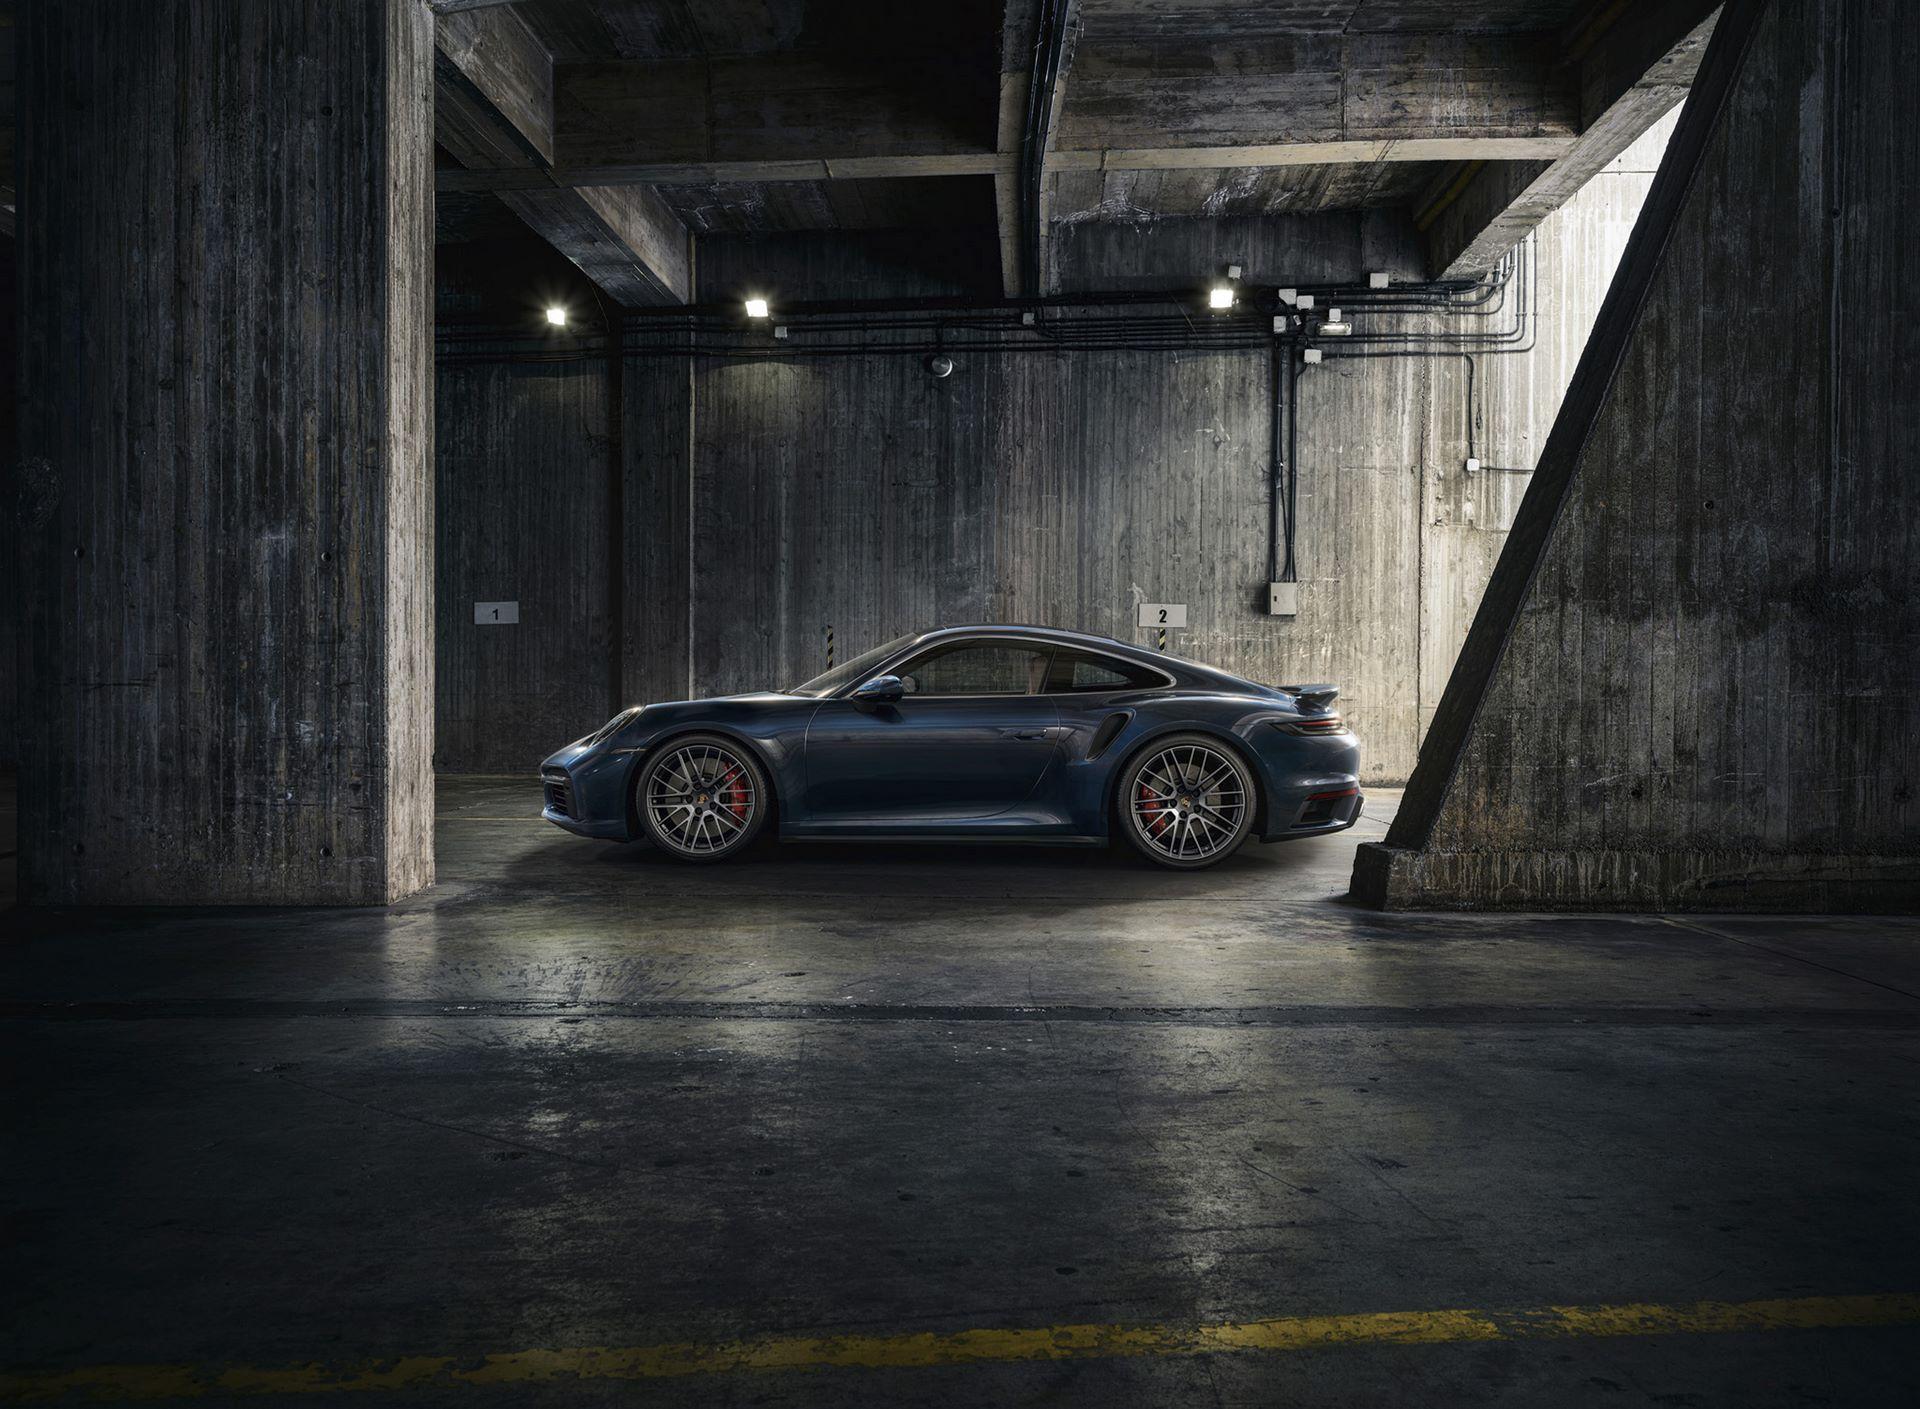 Porsche-911-Turbo-2020-3